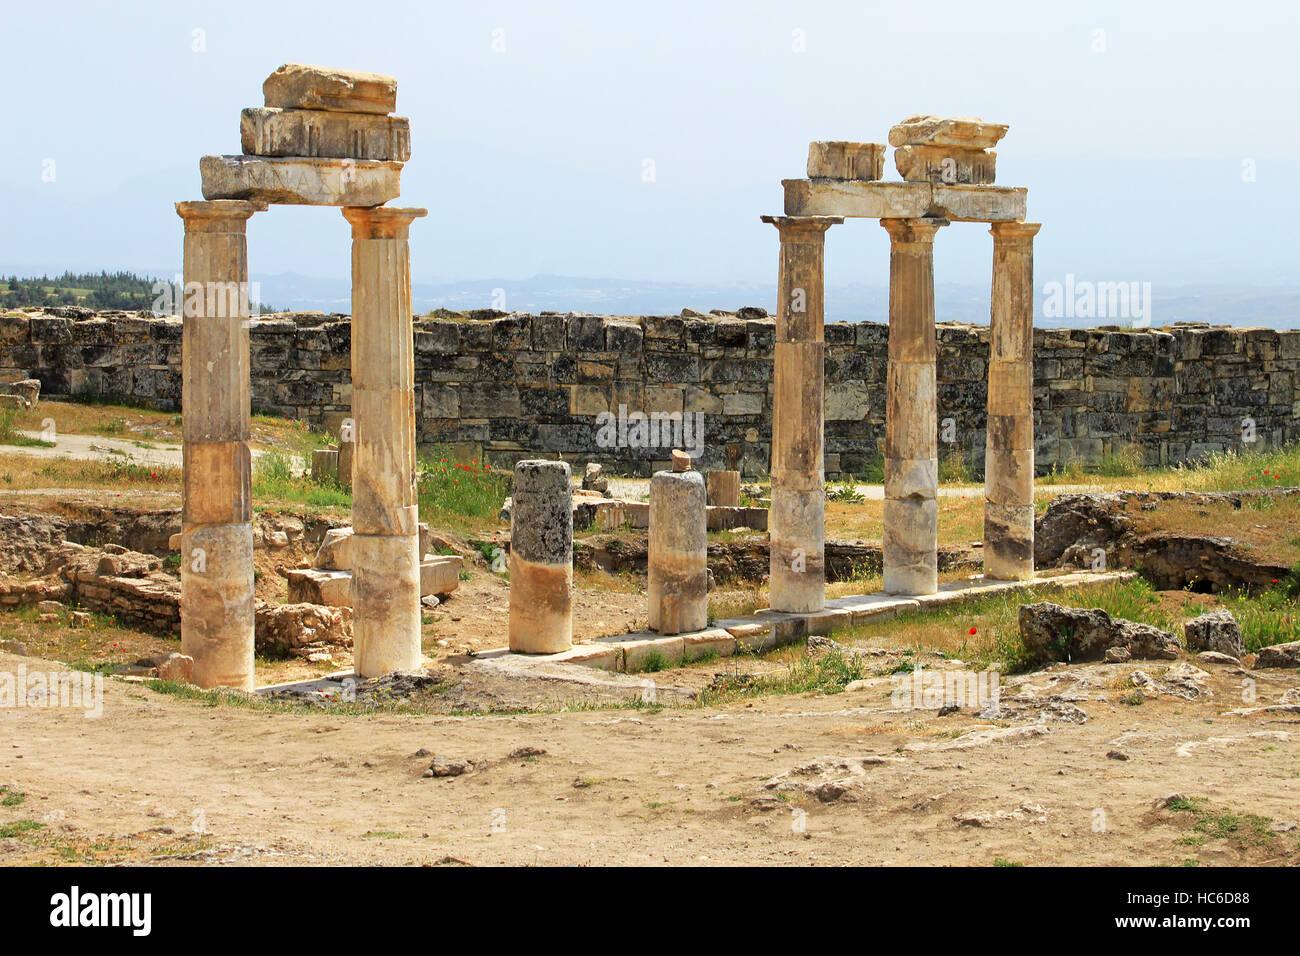 Pamukkale. Turkey. Ruins of Hierapolis, ancient city - Stock Image